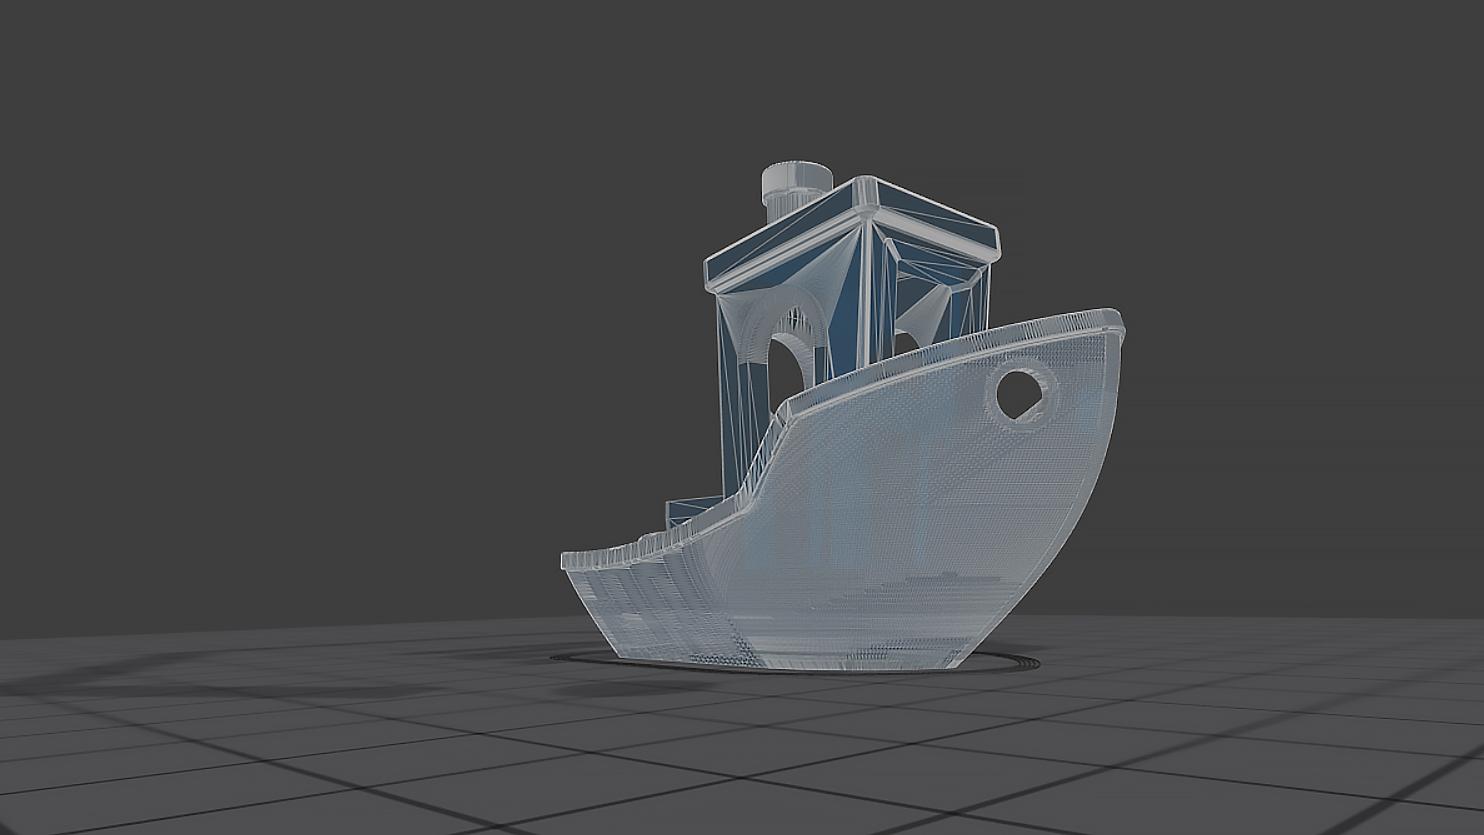 3D-Drucker-Software: Die besten Programme 2021 | All3DP